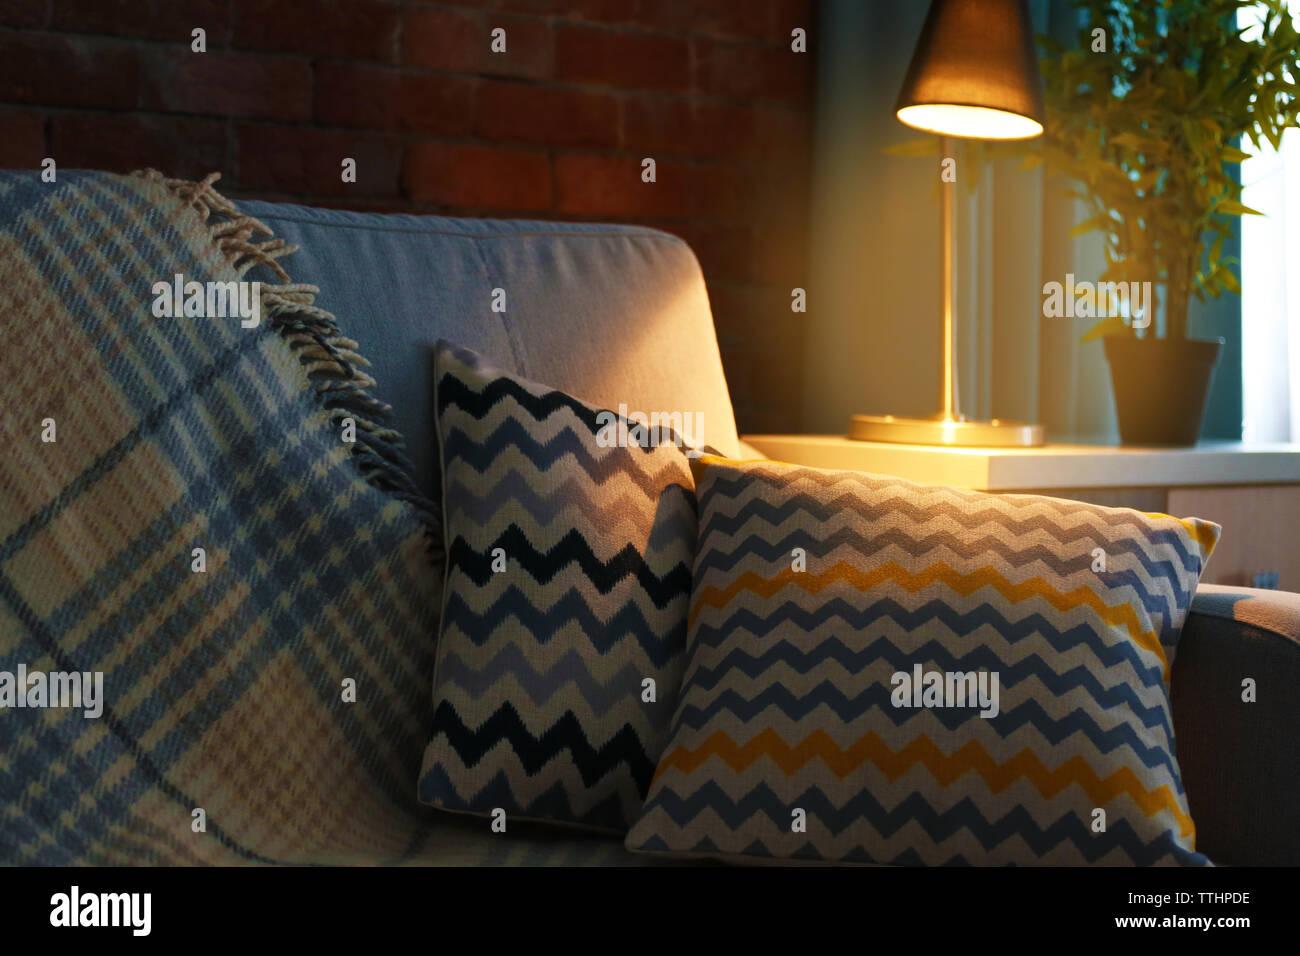 Cushions on sofa, indoors - Stock Image